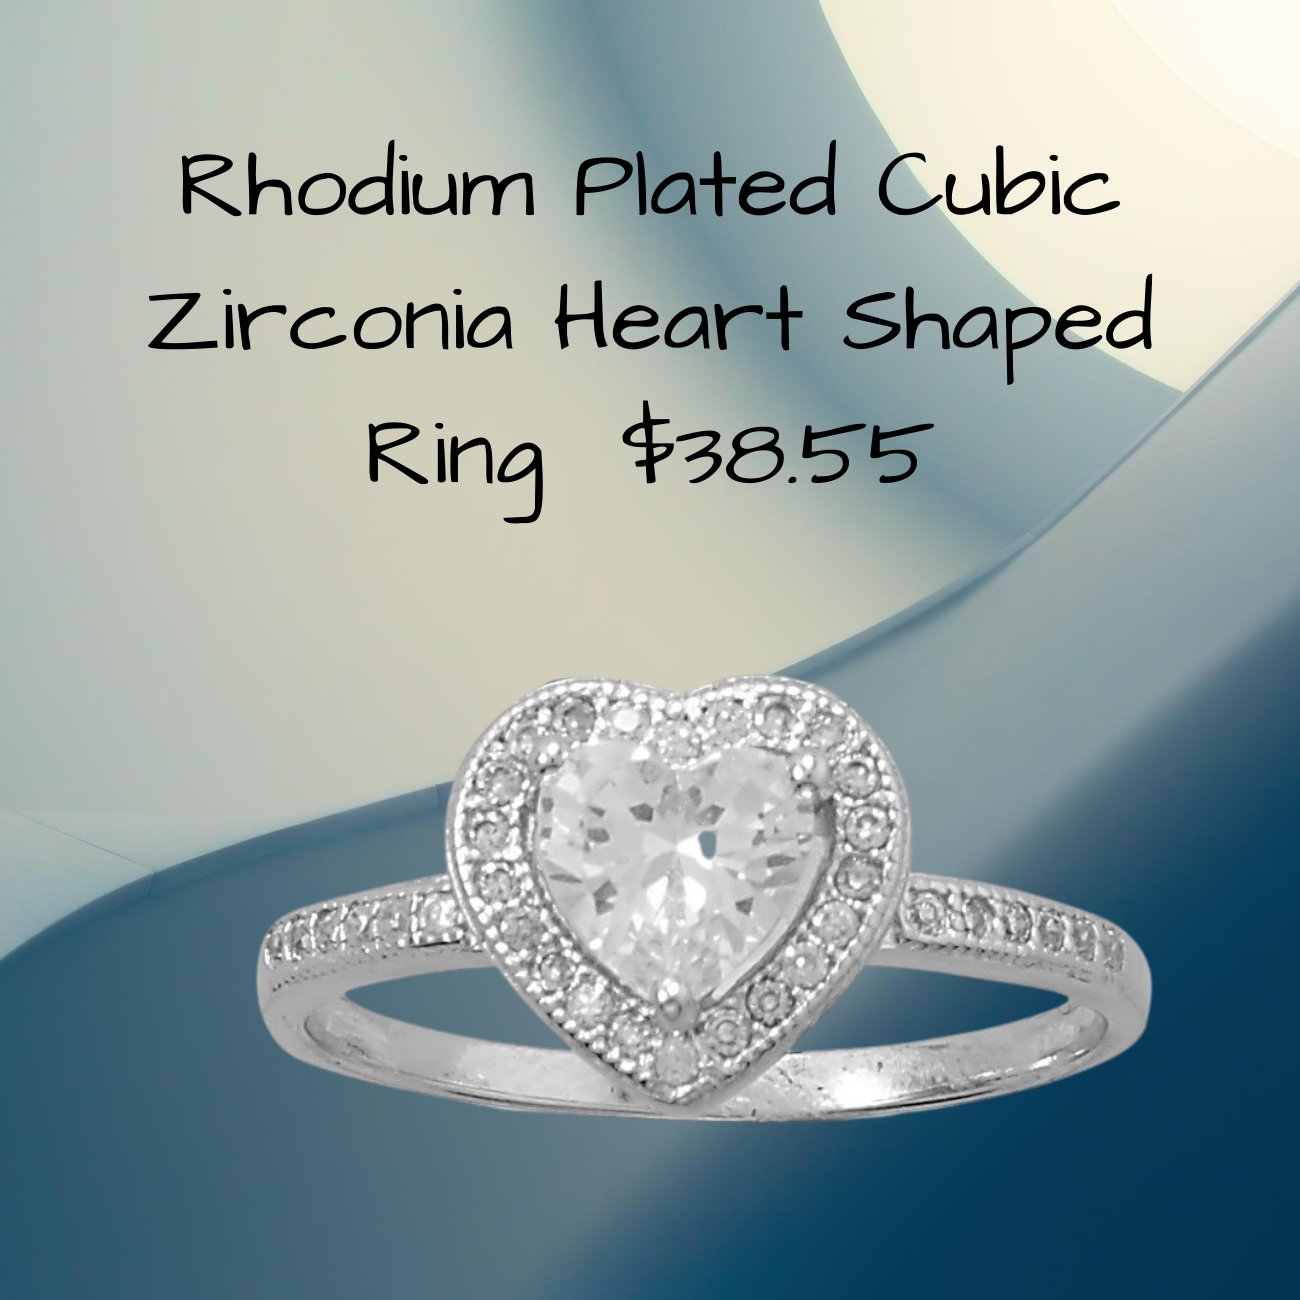 Rhodium Plated Cubic Zirconia Heart Ring